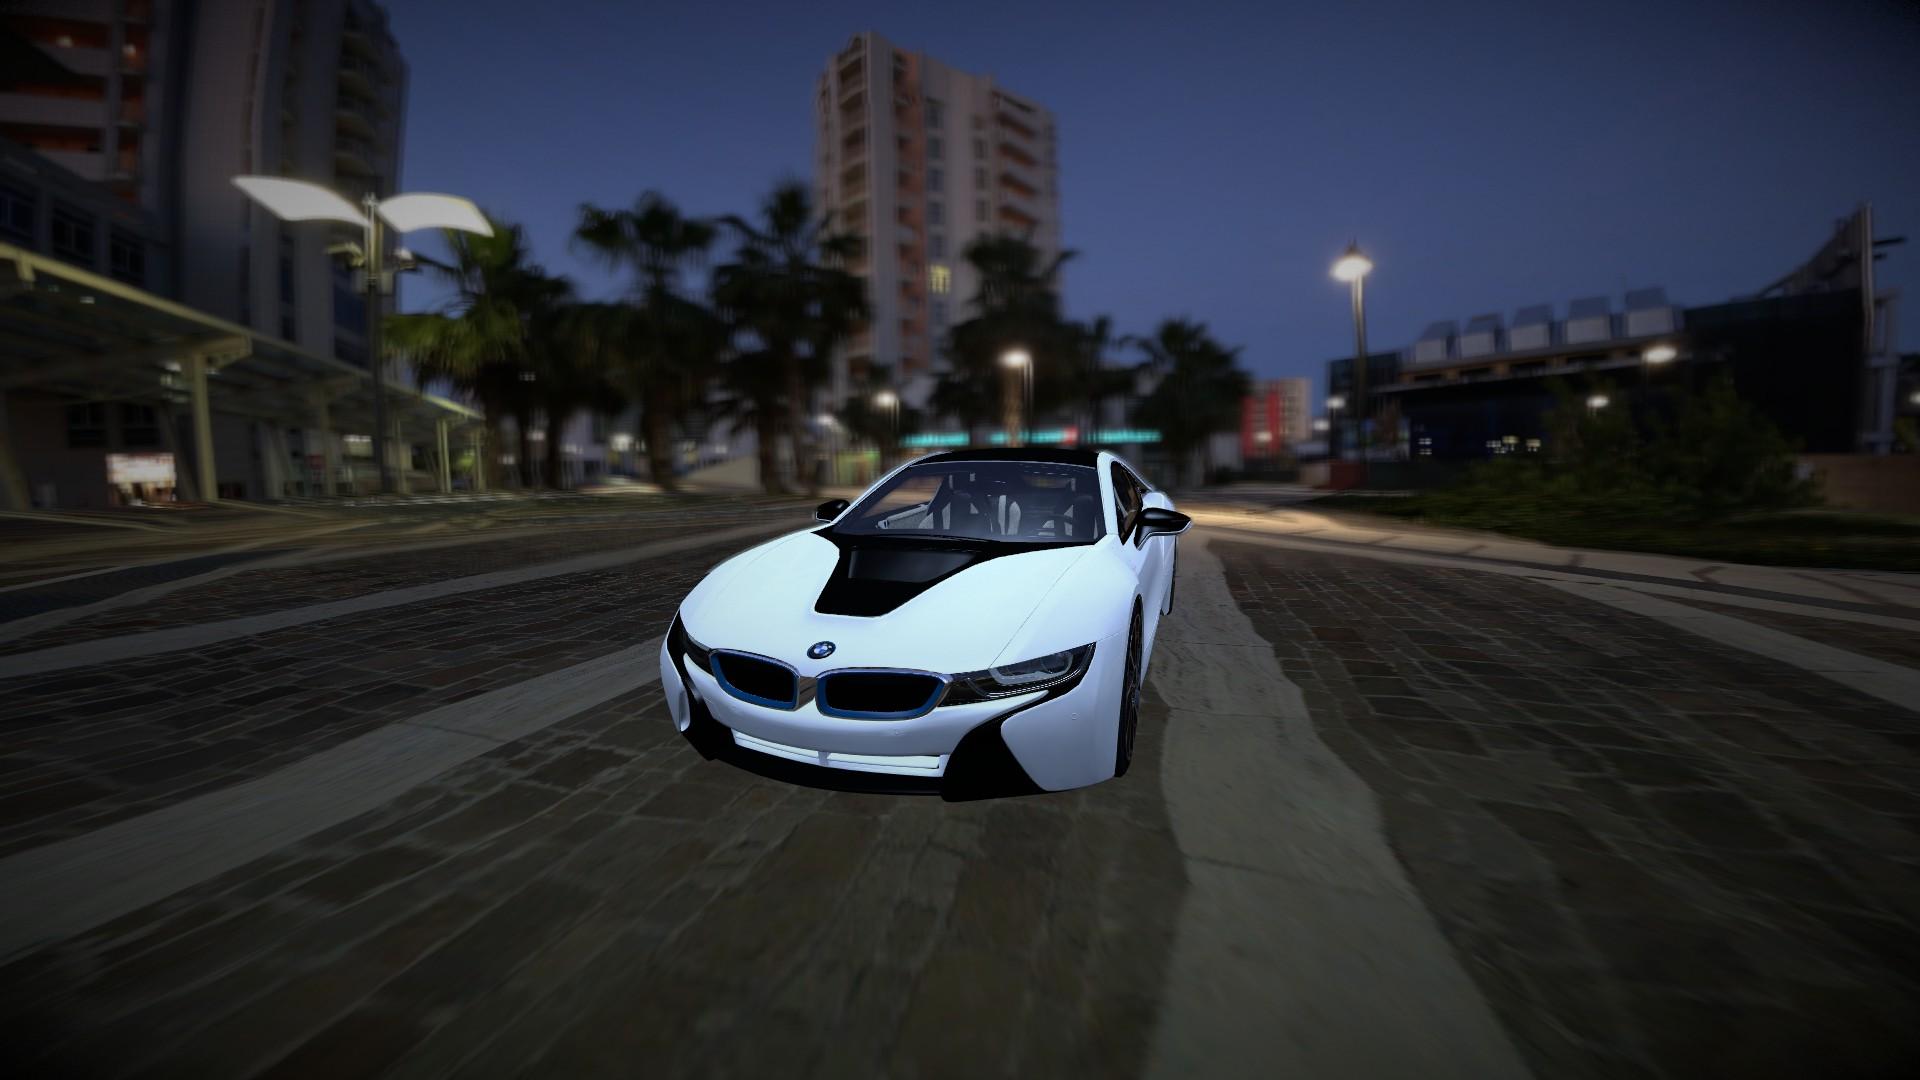 Steam Workshop :: CrSk Autos - BMW i8 2015